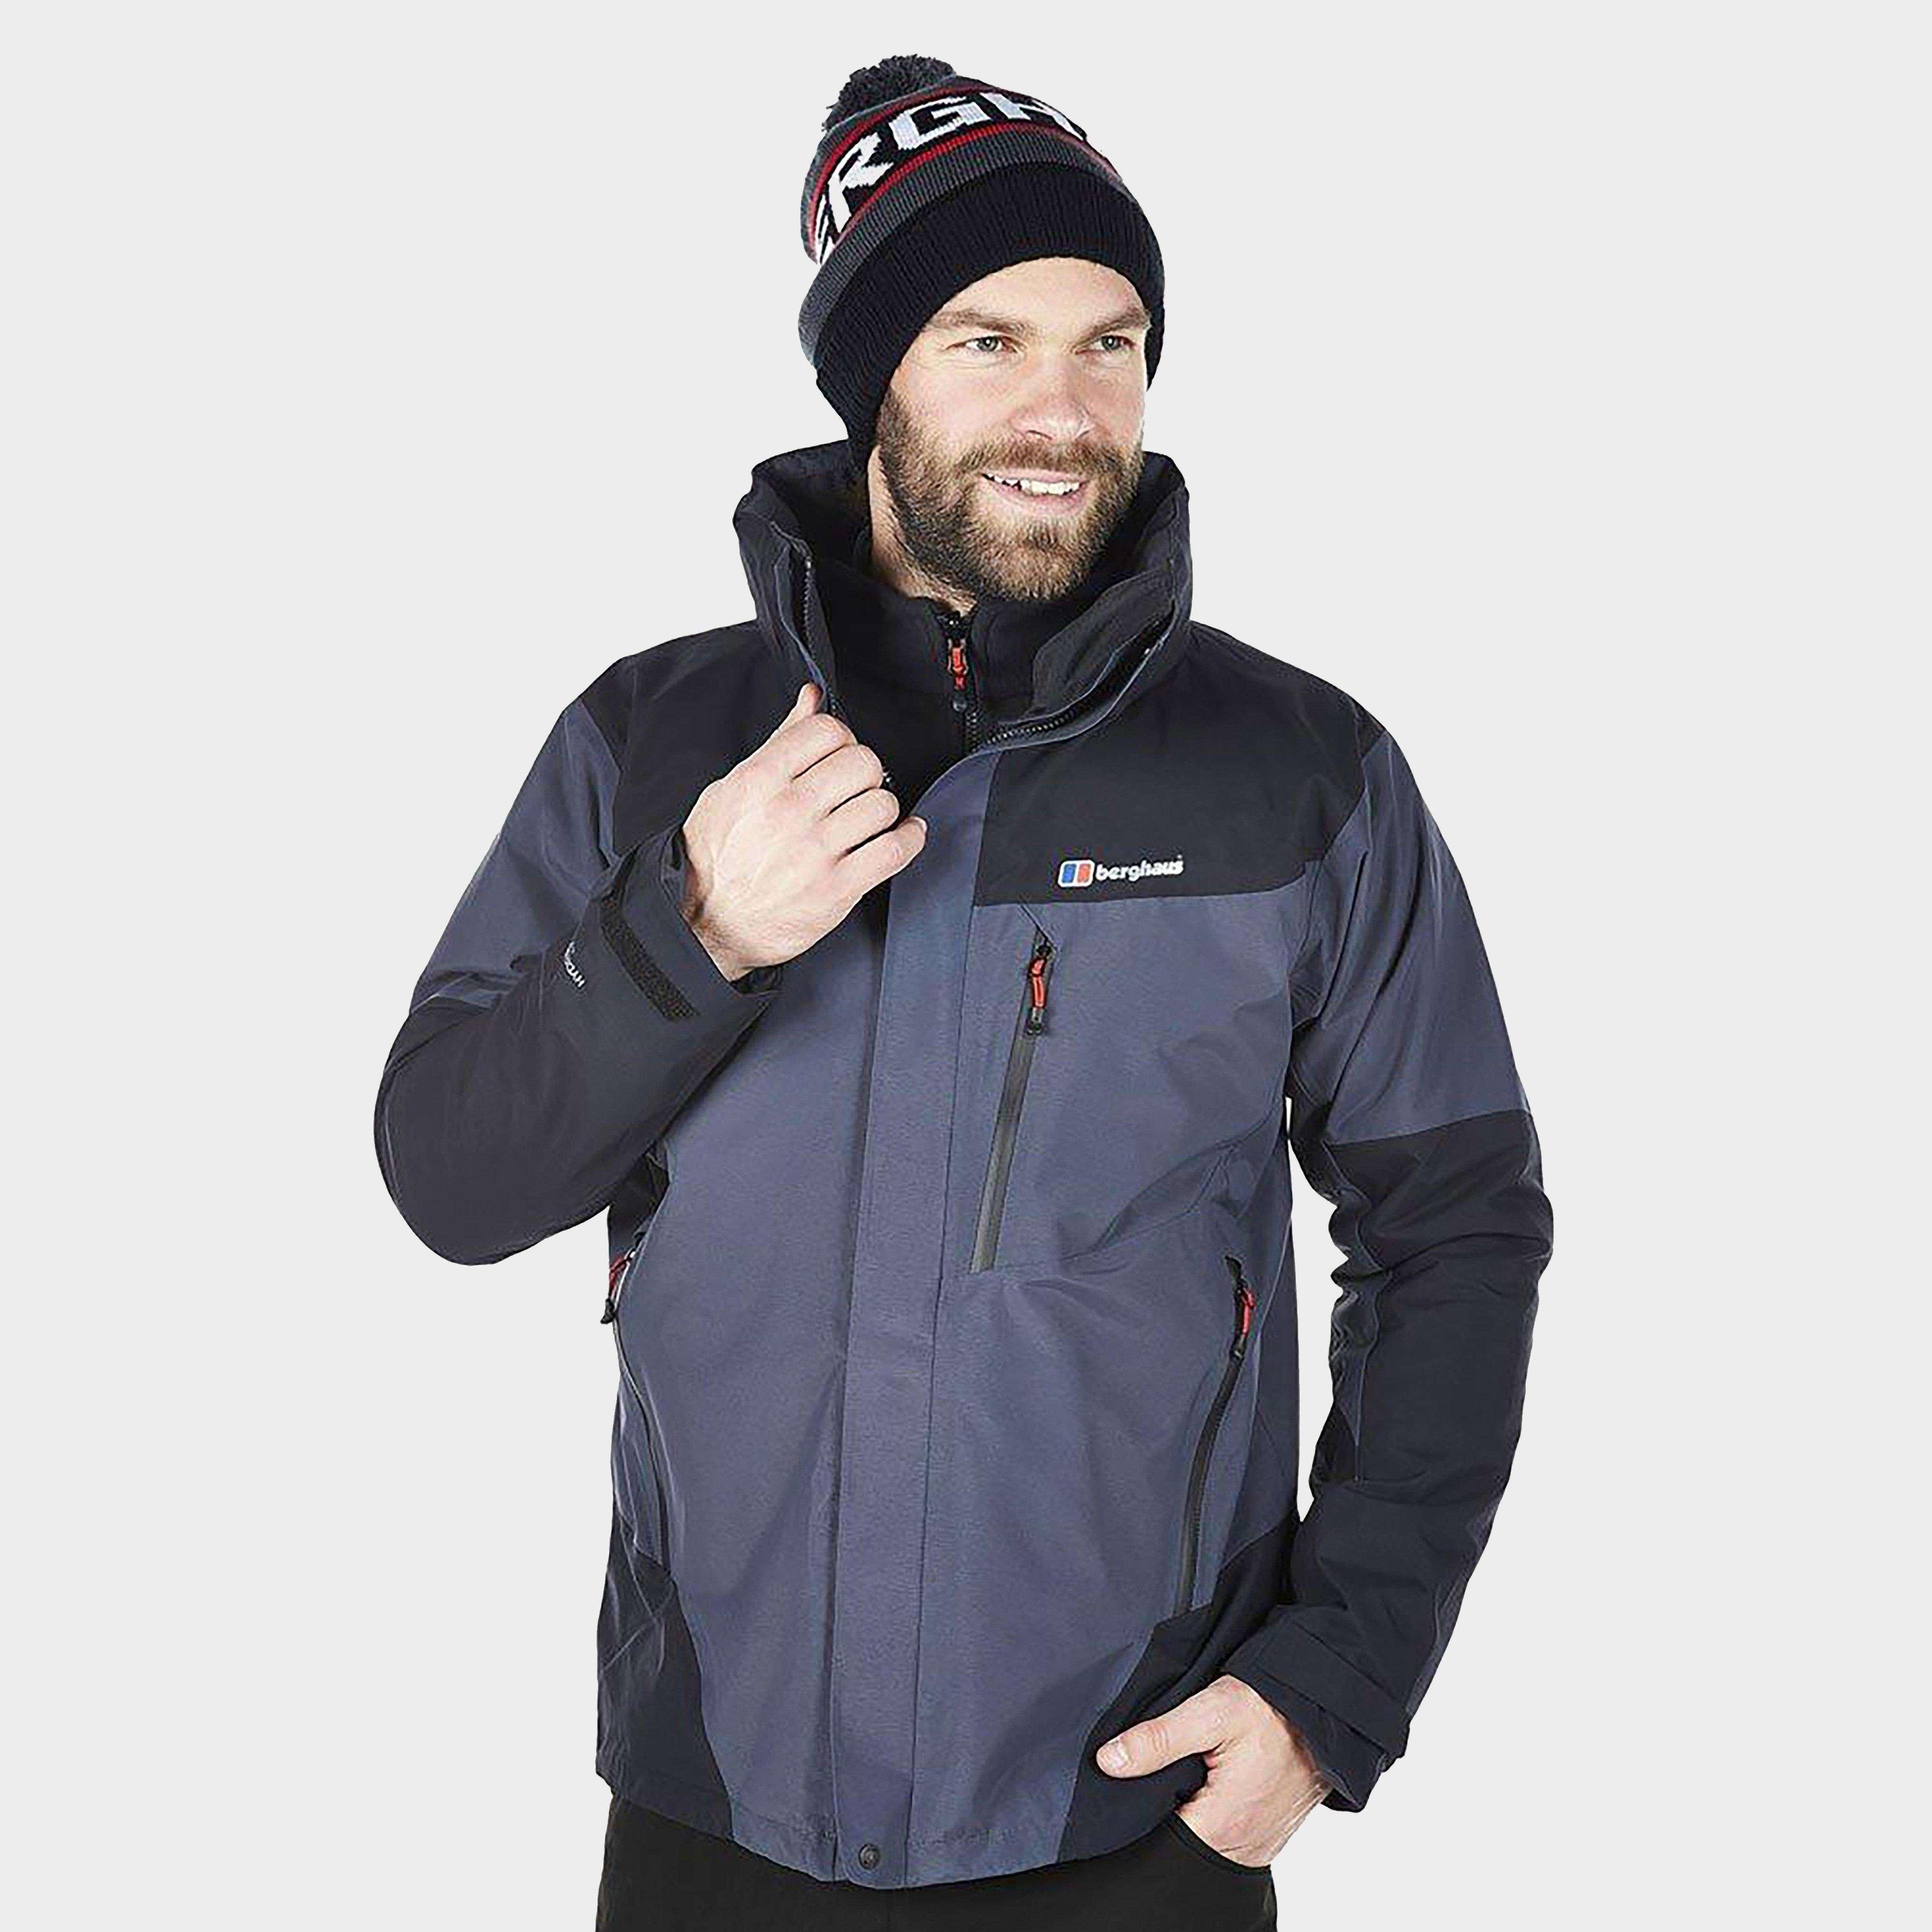 BERGHAUS Men's Arran 3 in 1 Jacket